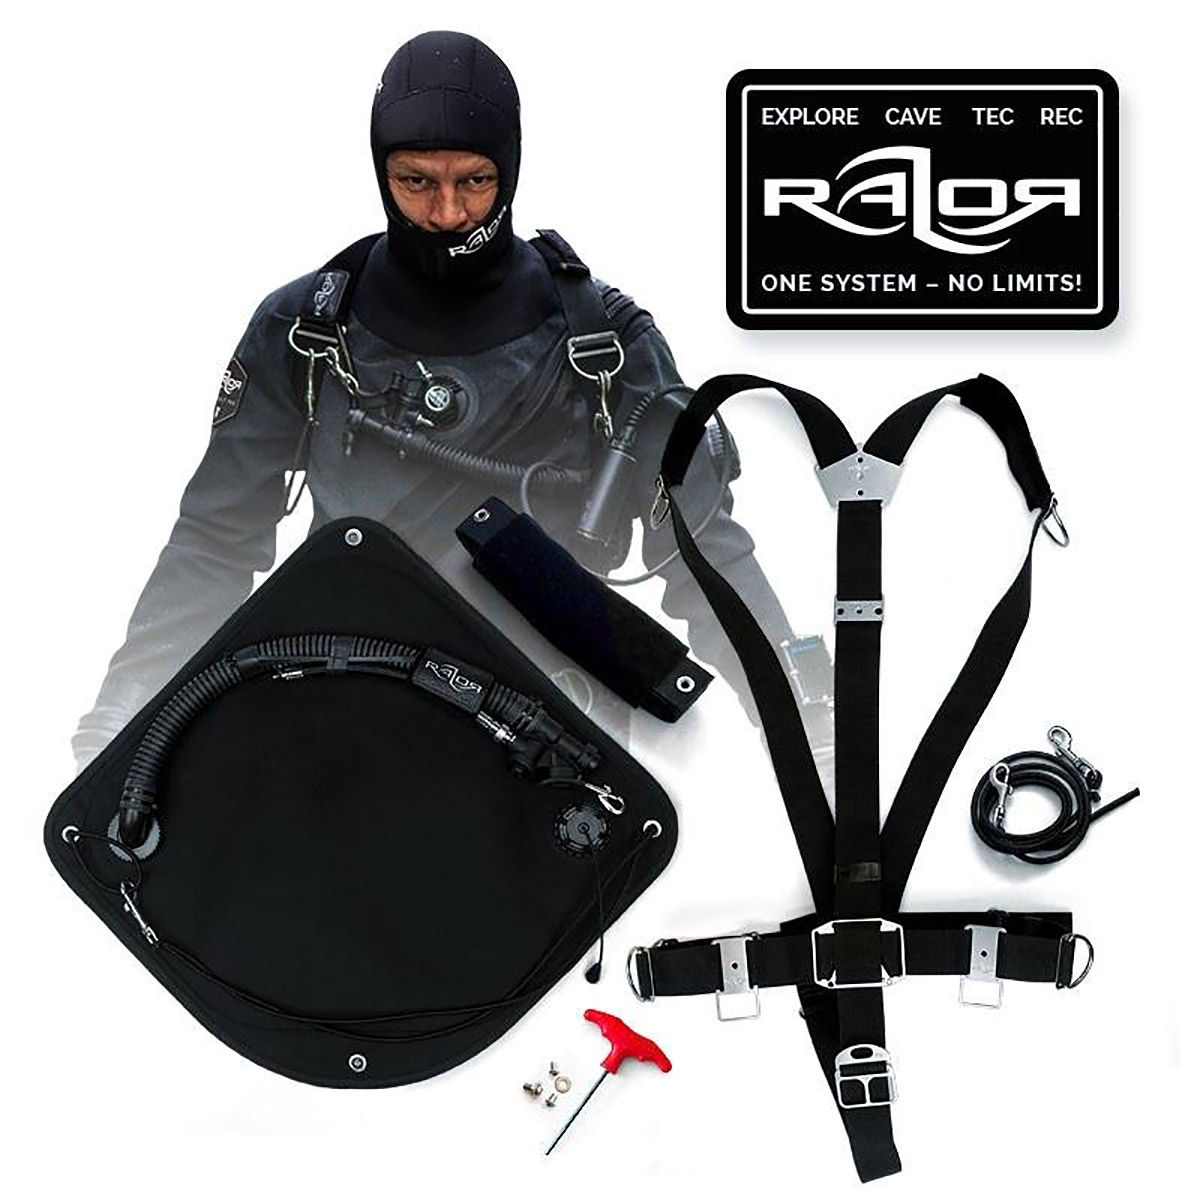 razor basic sidemount system 2.5